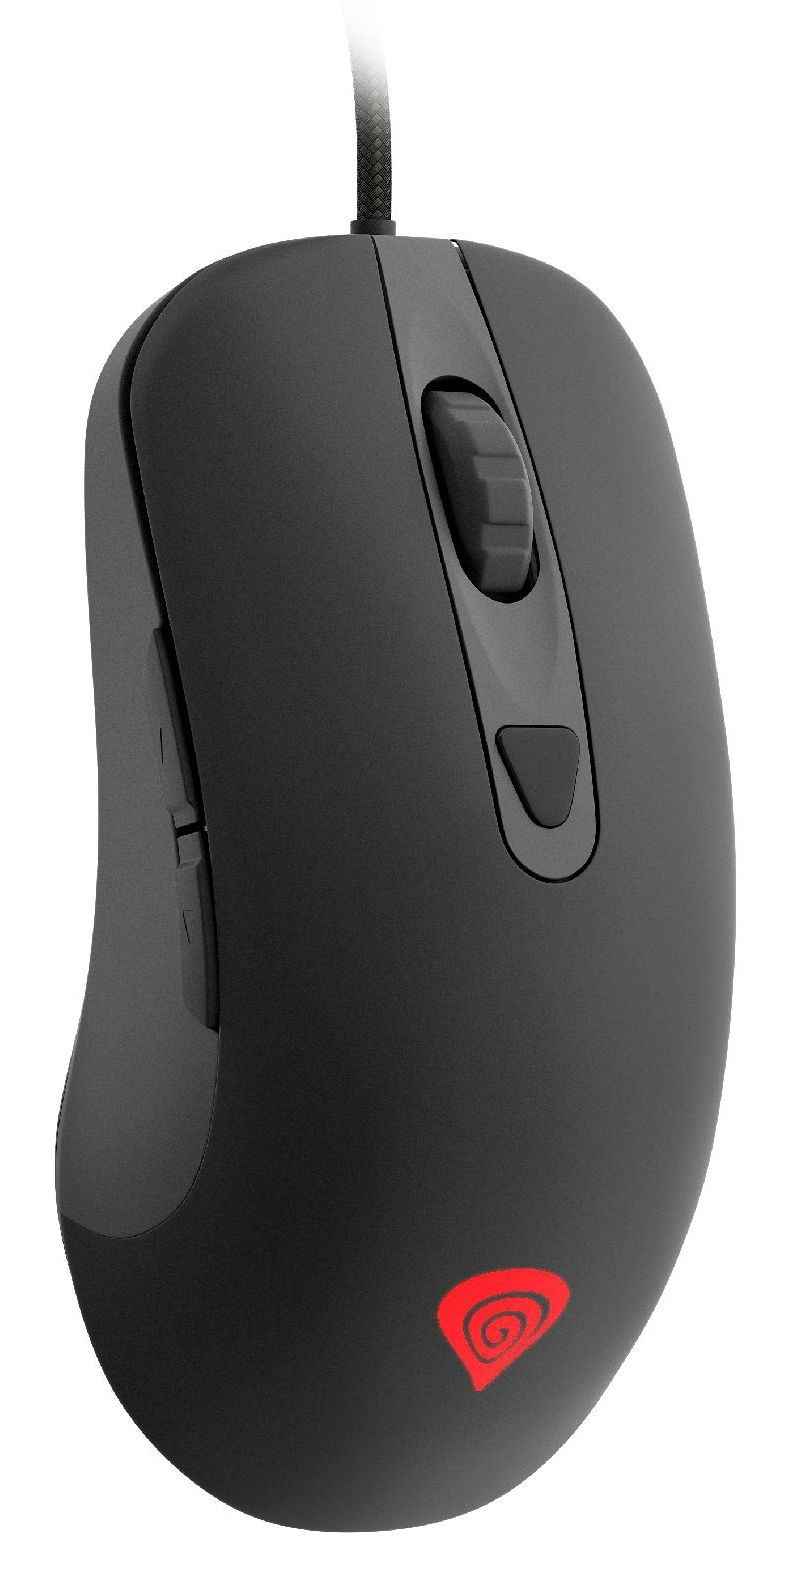 Гейминг мишка Genesis - Krypton 190, жична, оптична, черна - 2